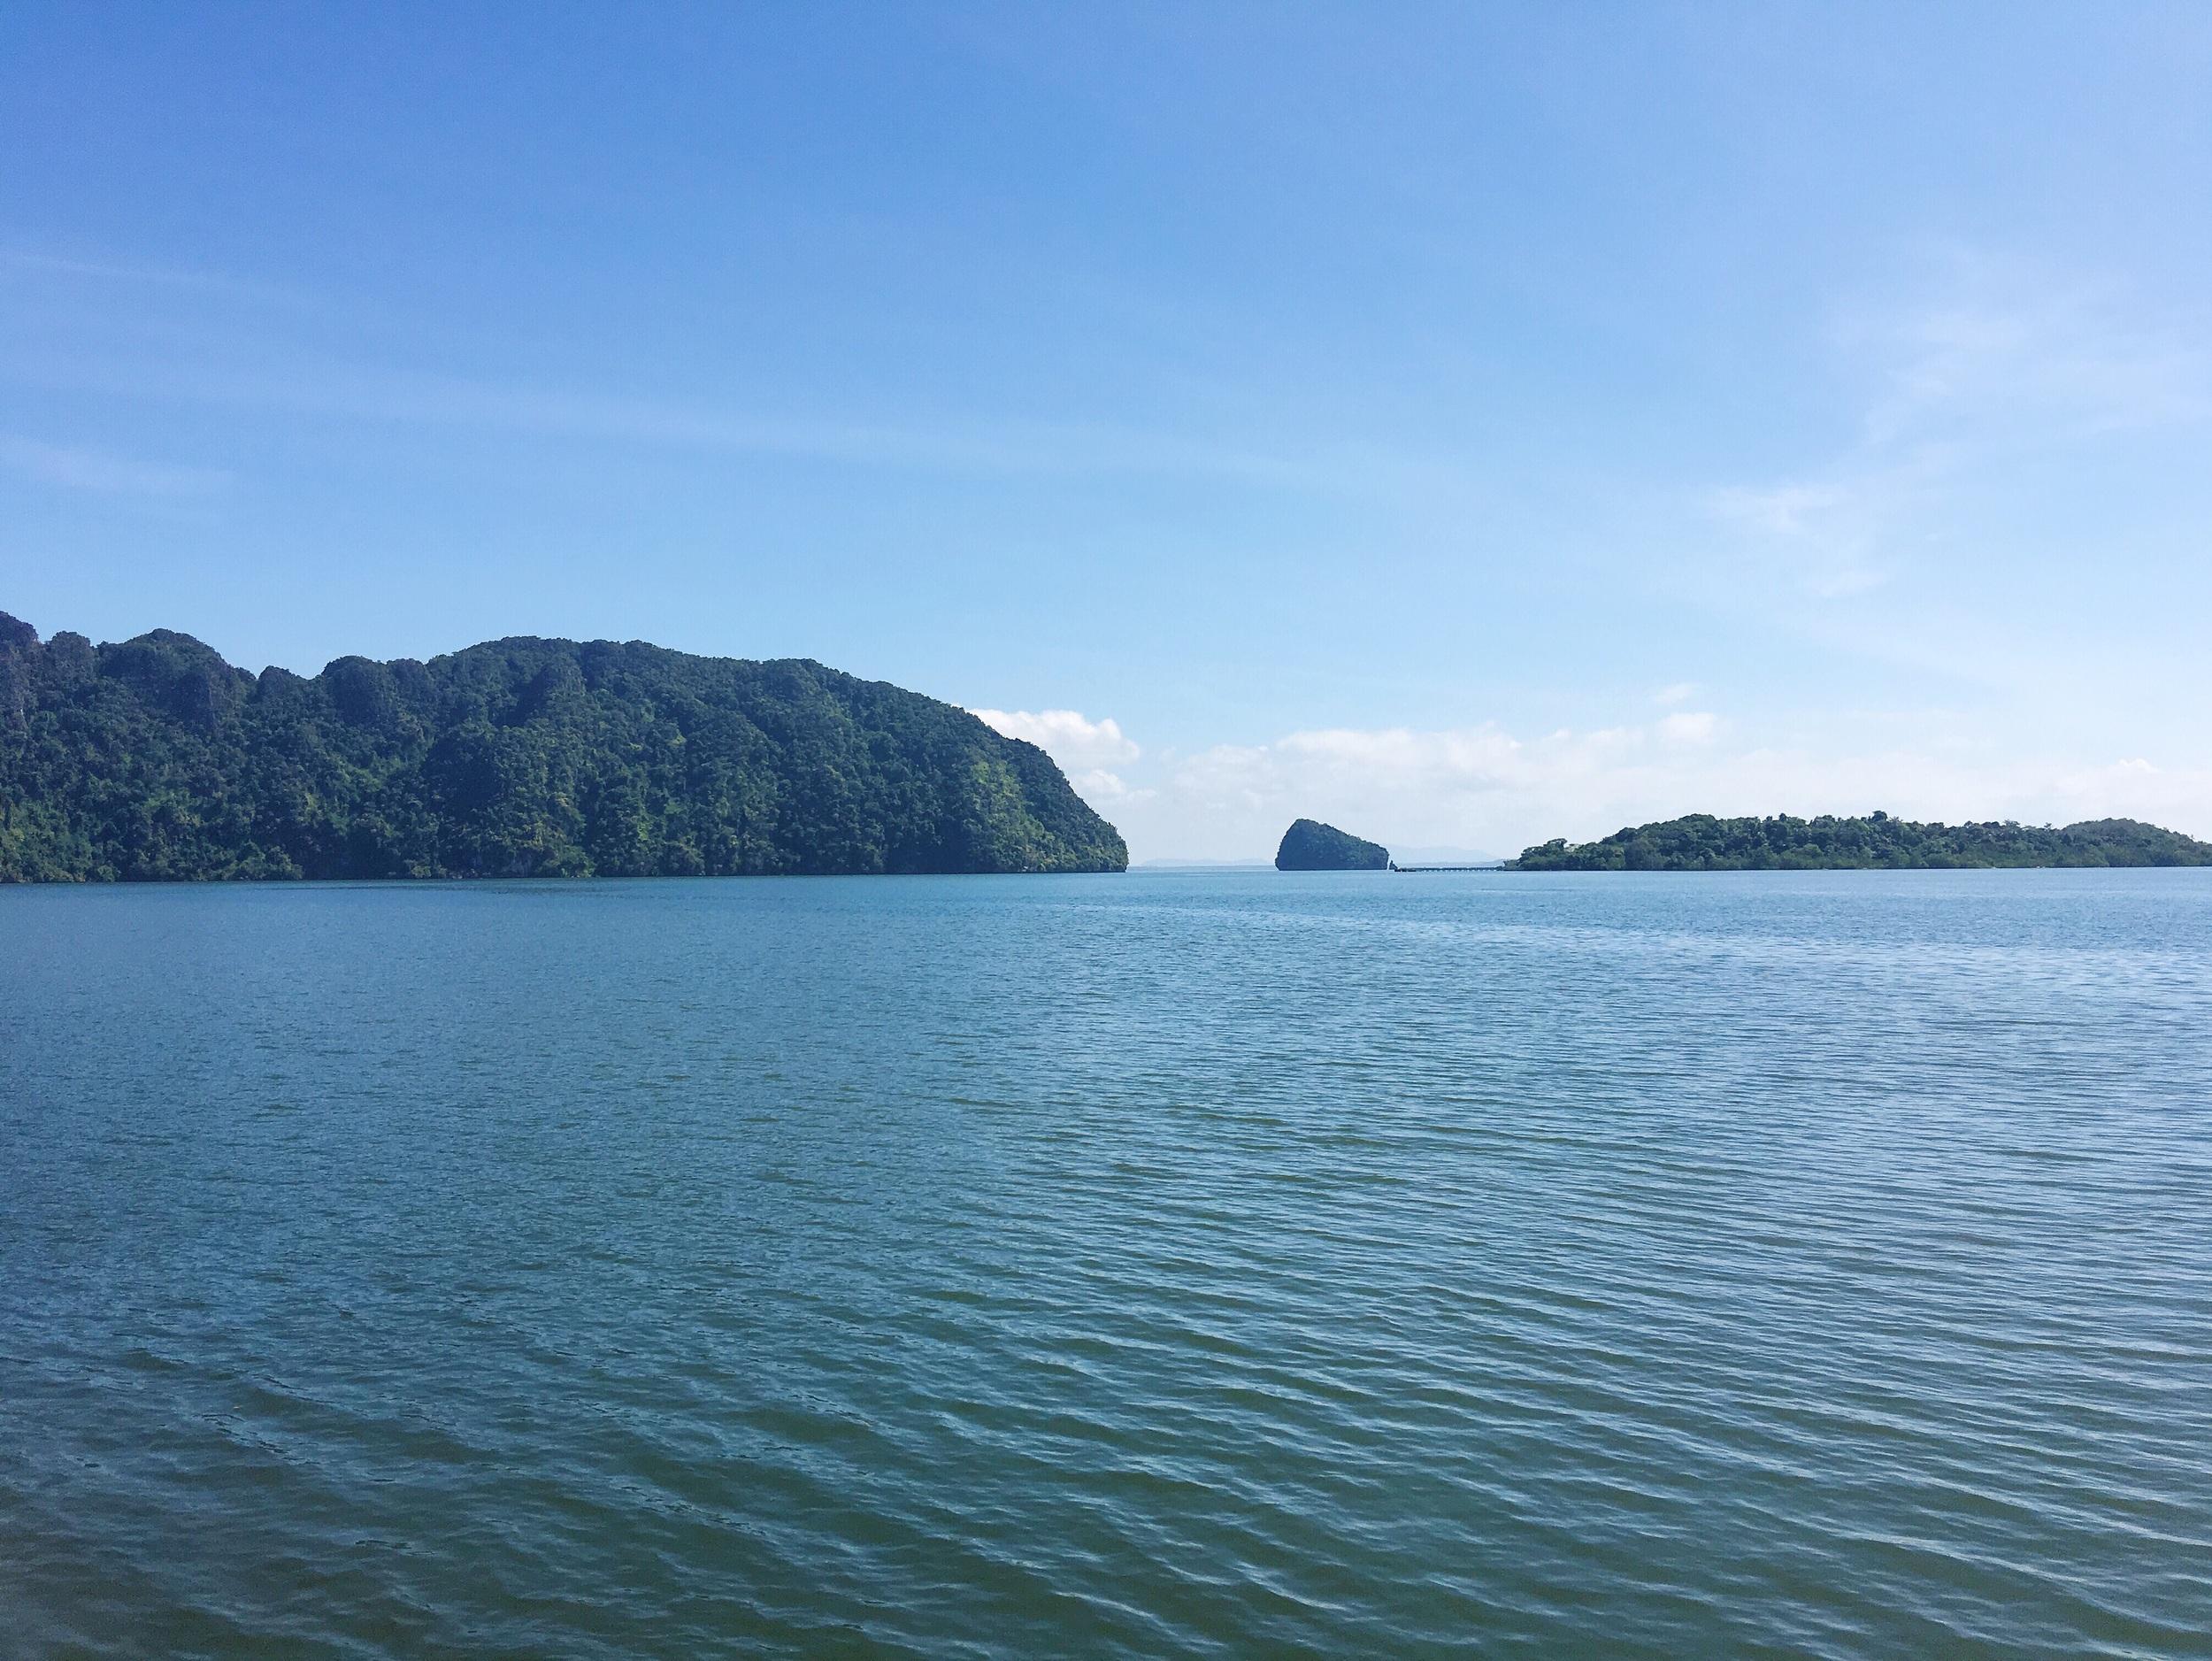 We took a speedboat from Krabi to Koh Lanta